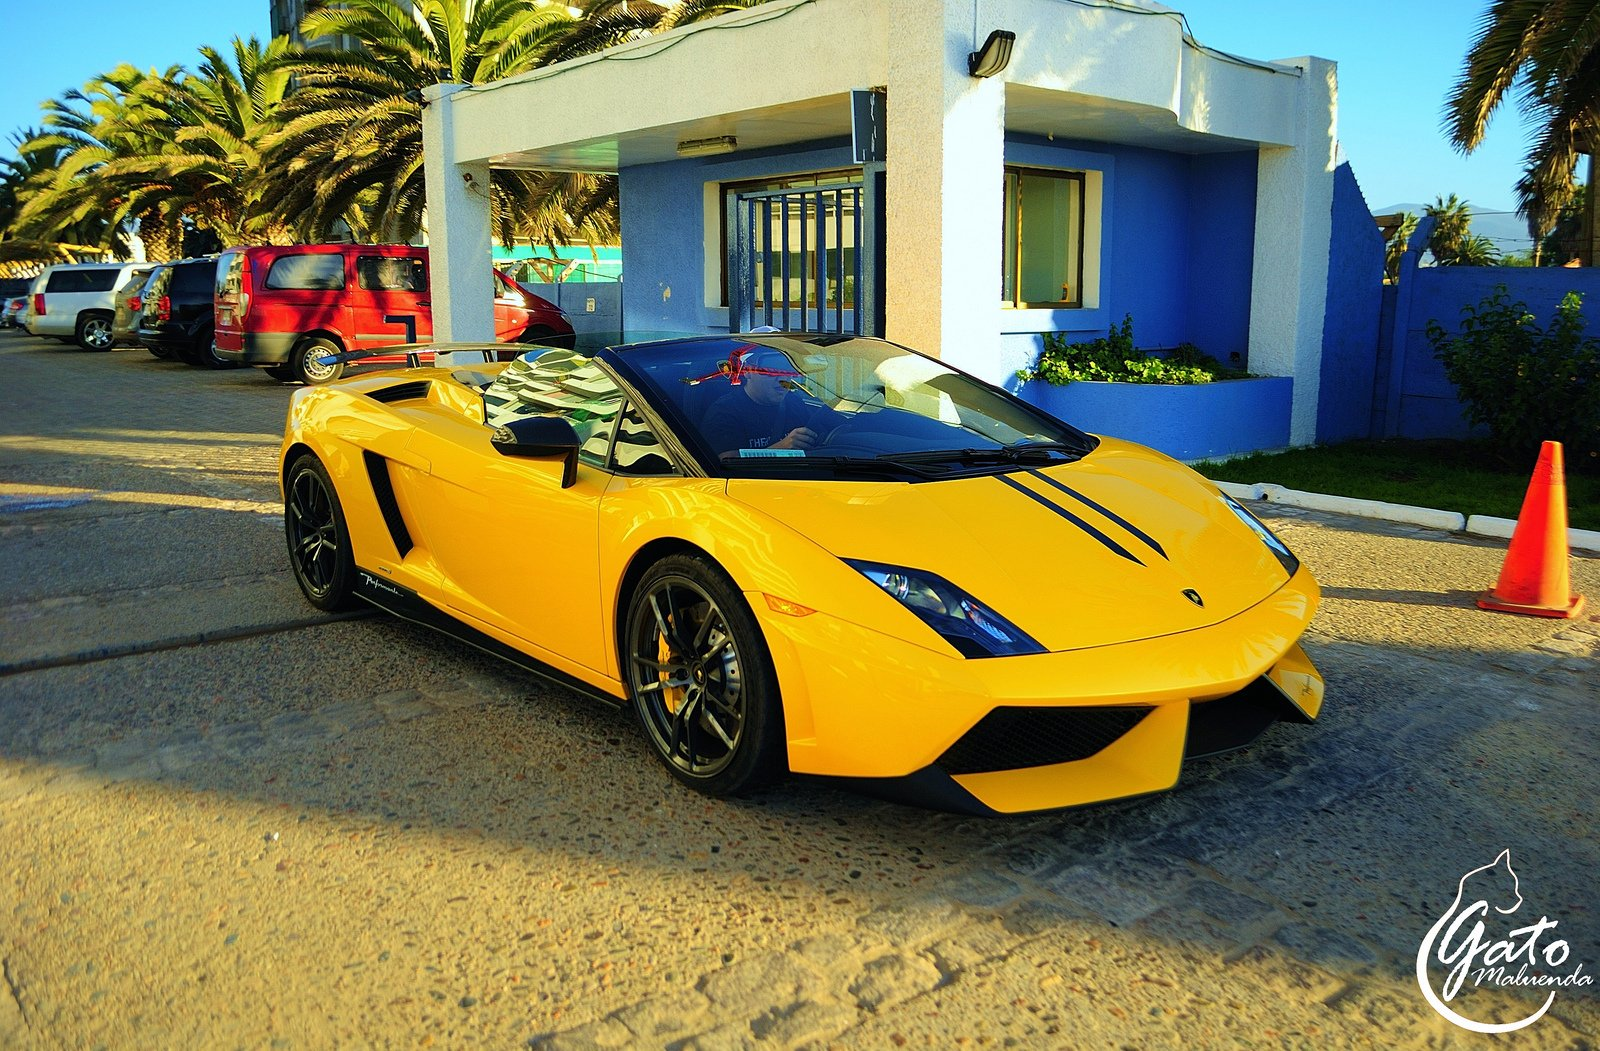 lamborghini gallardo lp570 4 spider performante cabriolet convertible roadster italian dreamcar supercar exotic sportscar jaune giallo yellow wallpaper - Yellow Lamborghini Gallardo Spyder Wallpaper